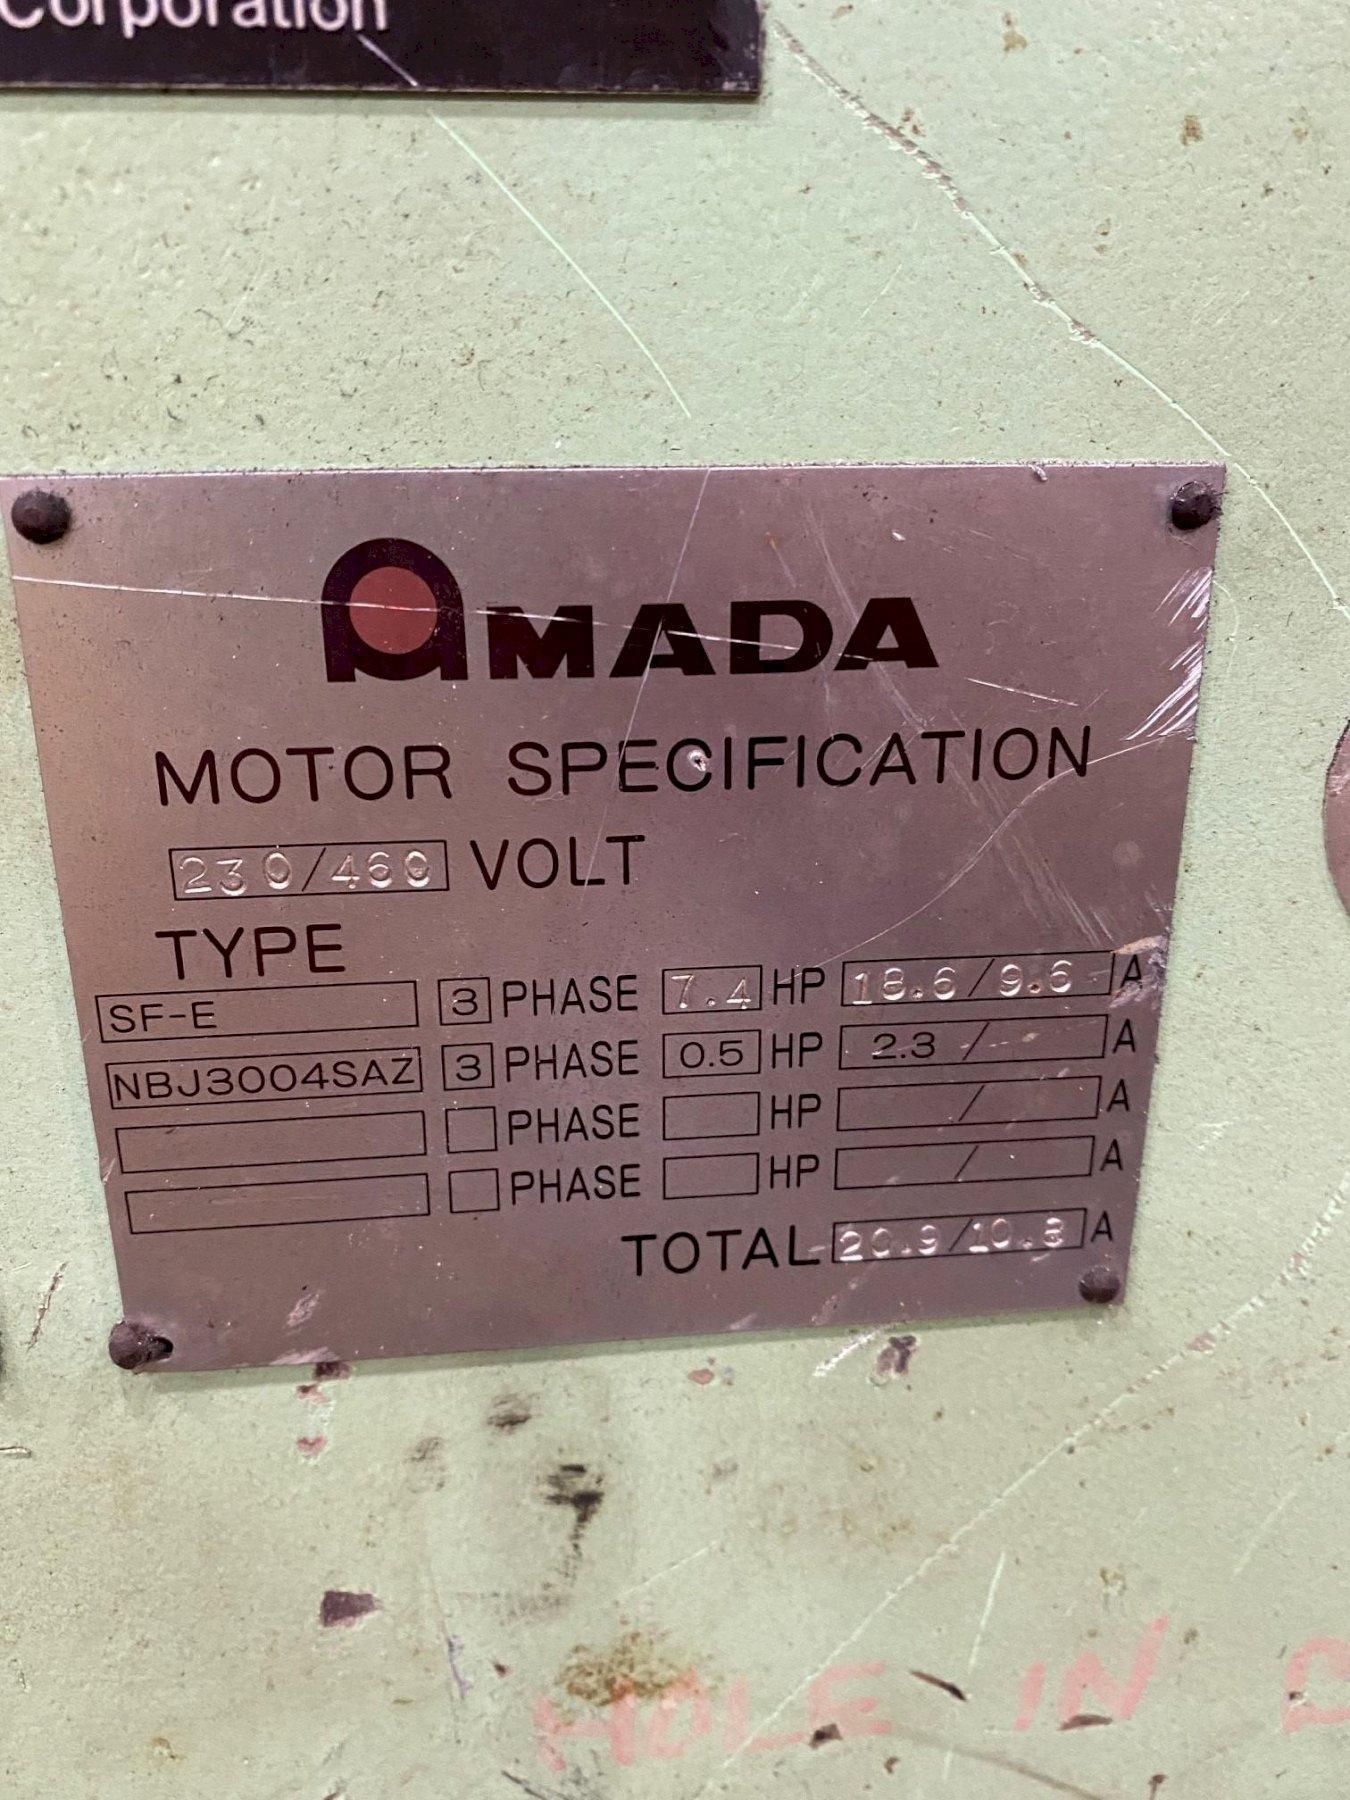 "6.5' x 3/16"" AMADA MODEL #M-2045 MECHANICAL POWER SHEAR: STOCK #15407"